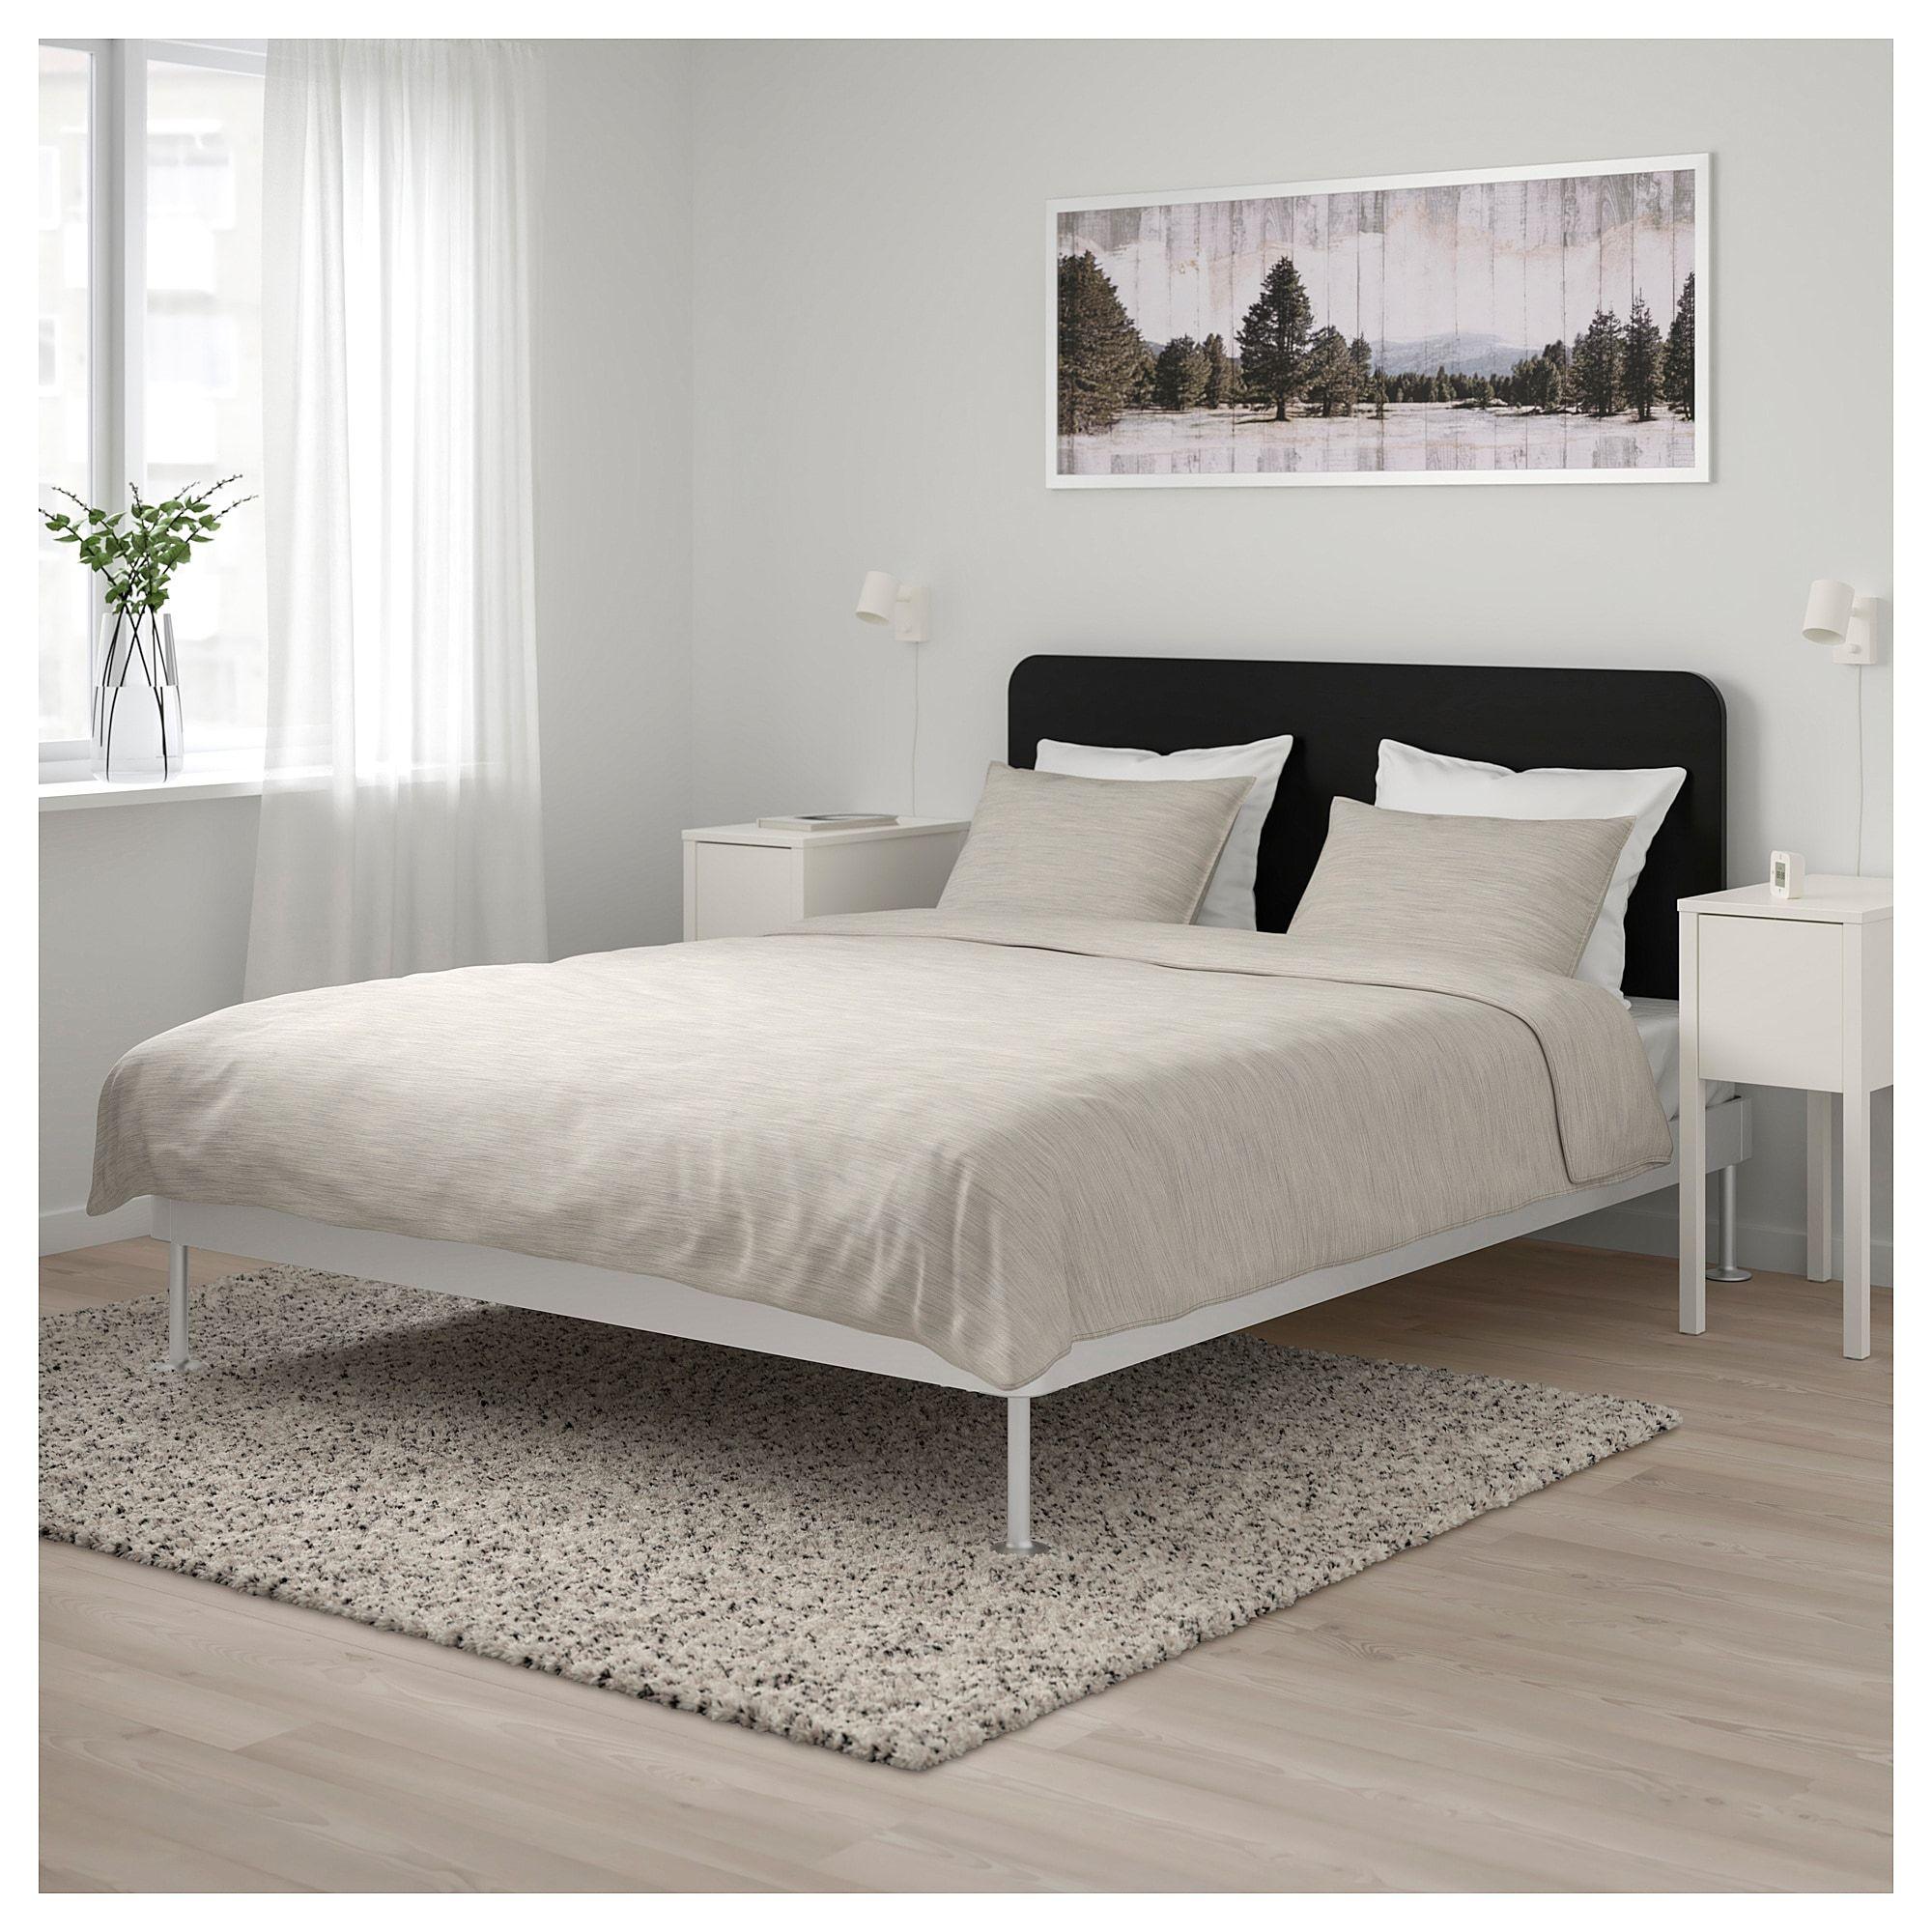 Ikea Delaktig Bed Frame With Headboard Aluminum Black In